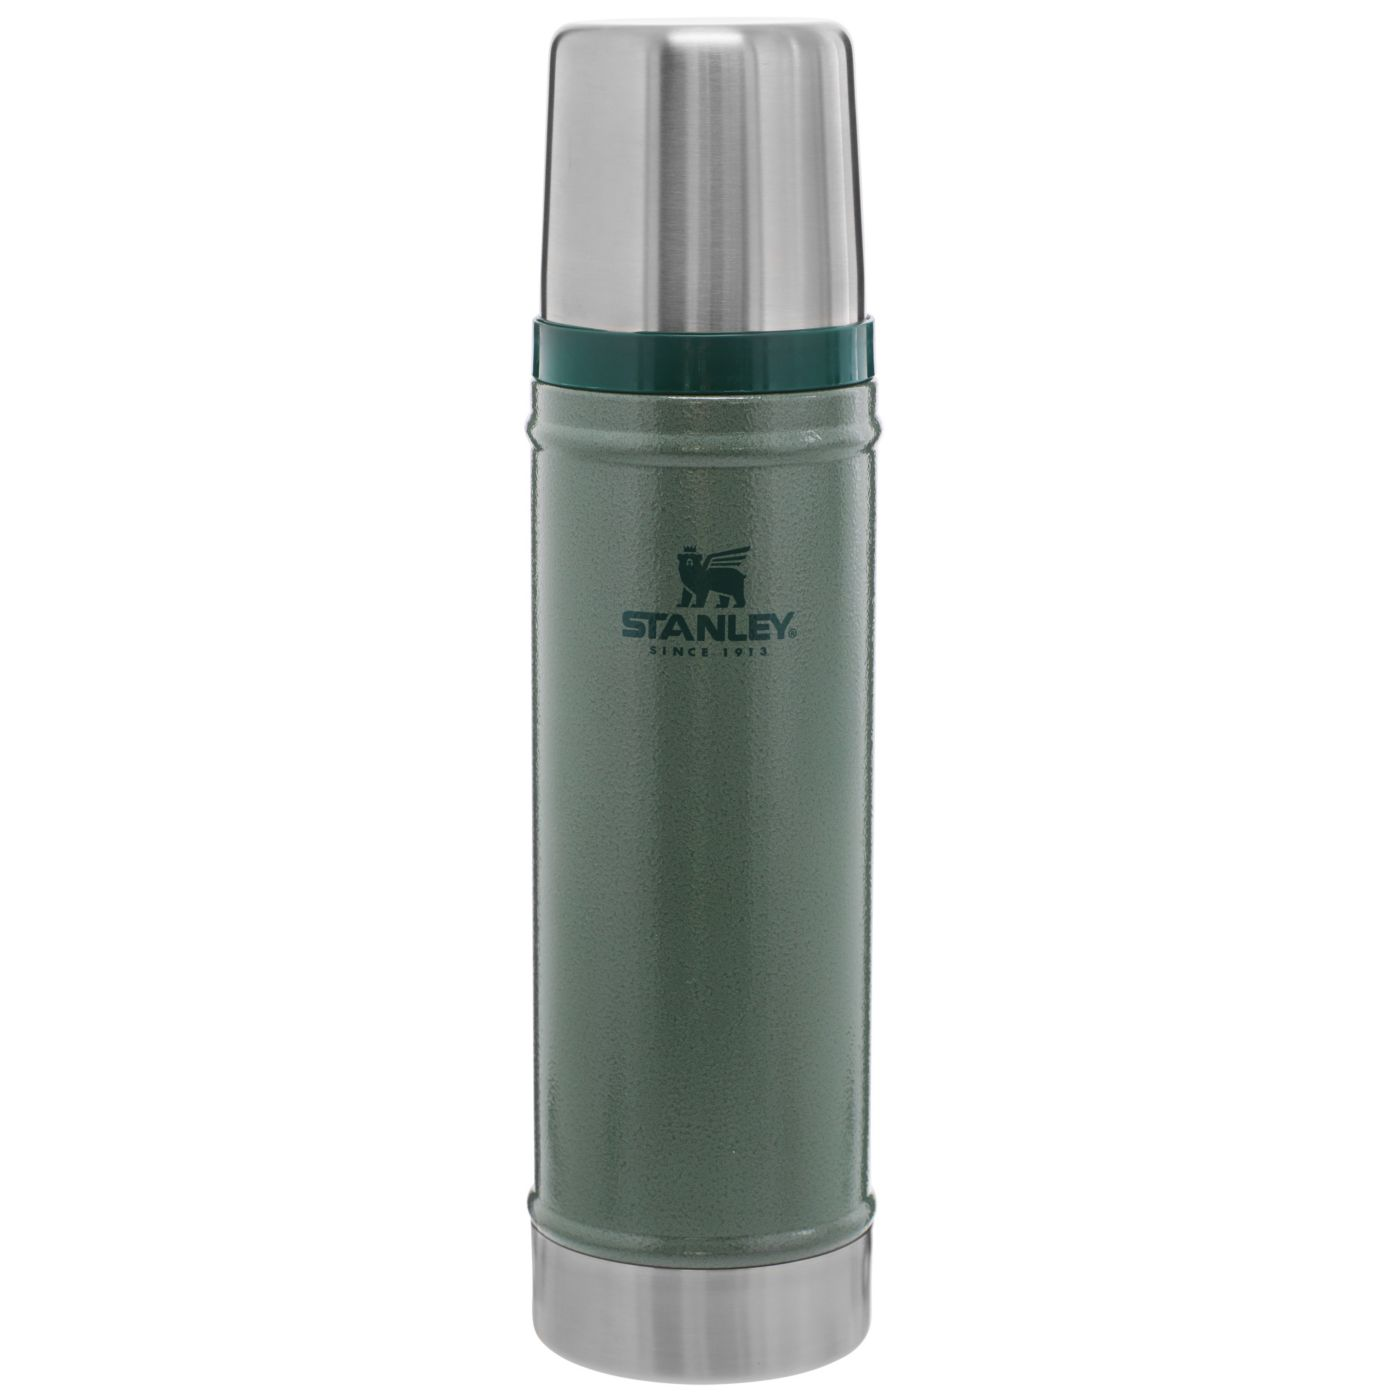 Stanley Classic Legendary 20 oz. Water Bottle